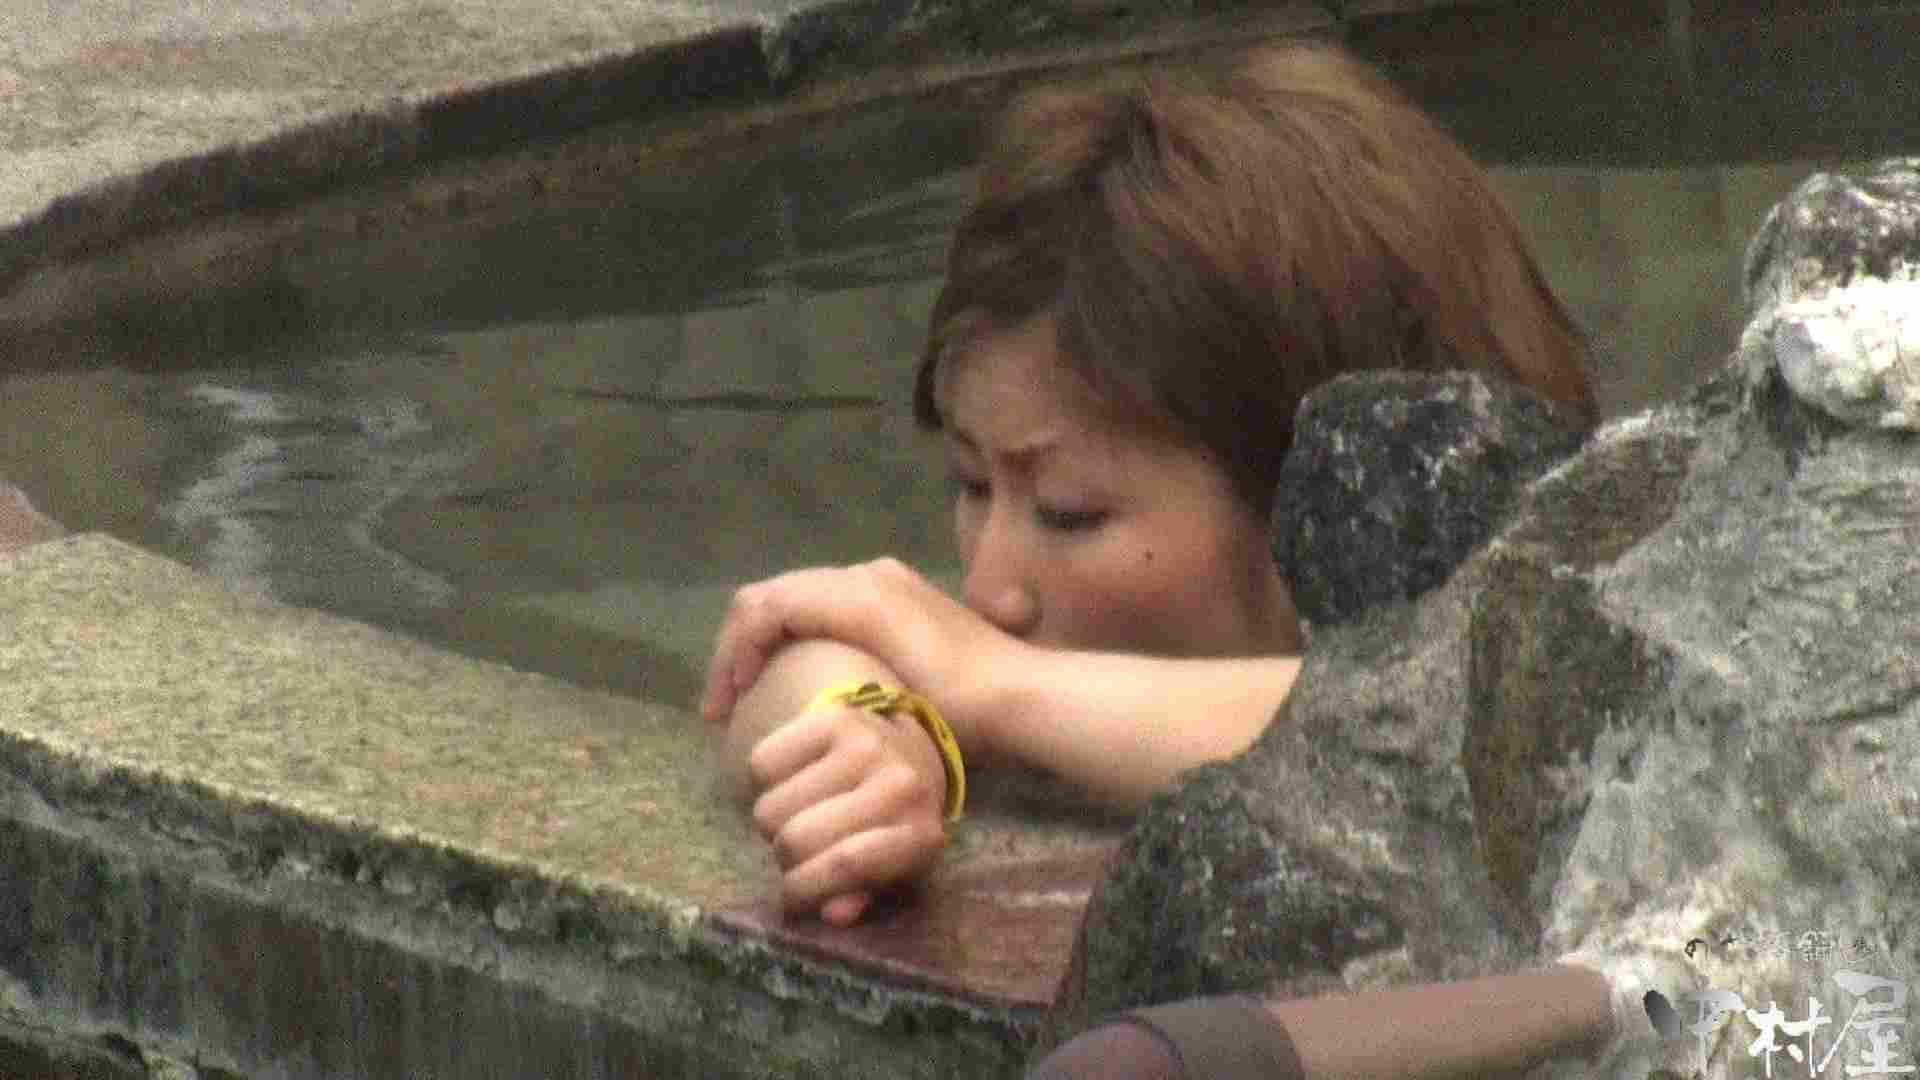 Aquaな露天風呂Vol.918 露天風呂突入 おまんこ無修正動画無料 75pic 41